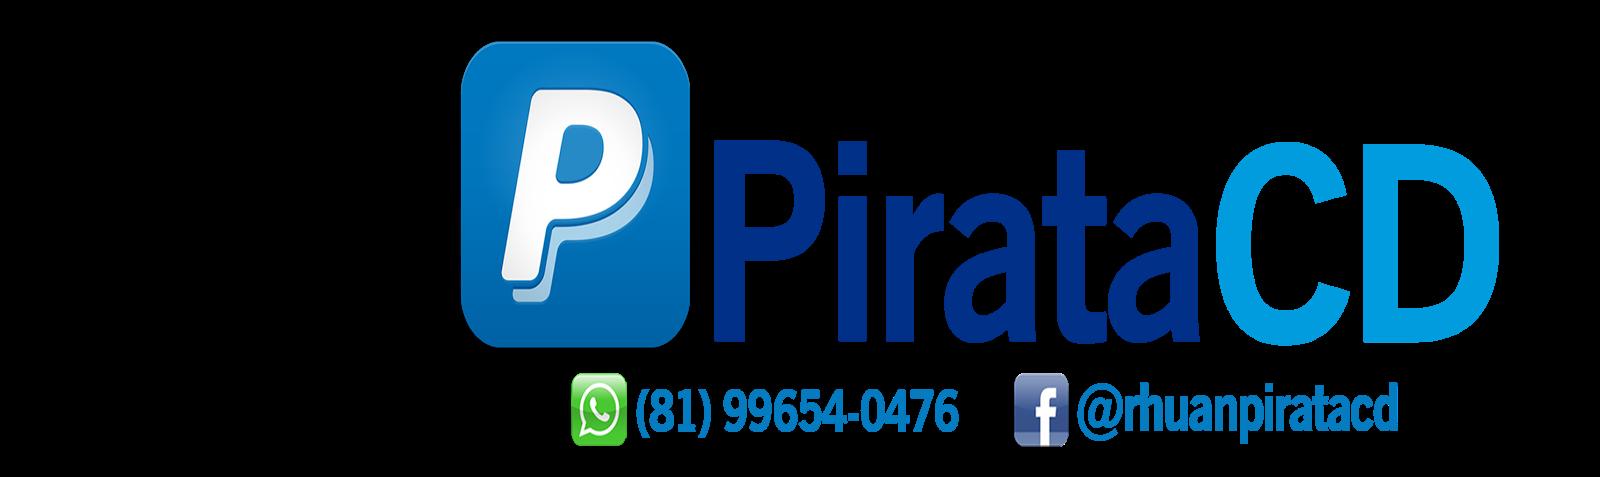 PirataCD